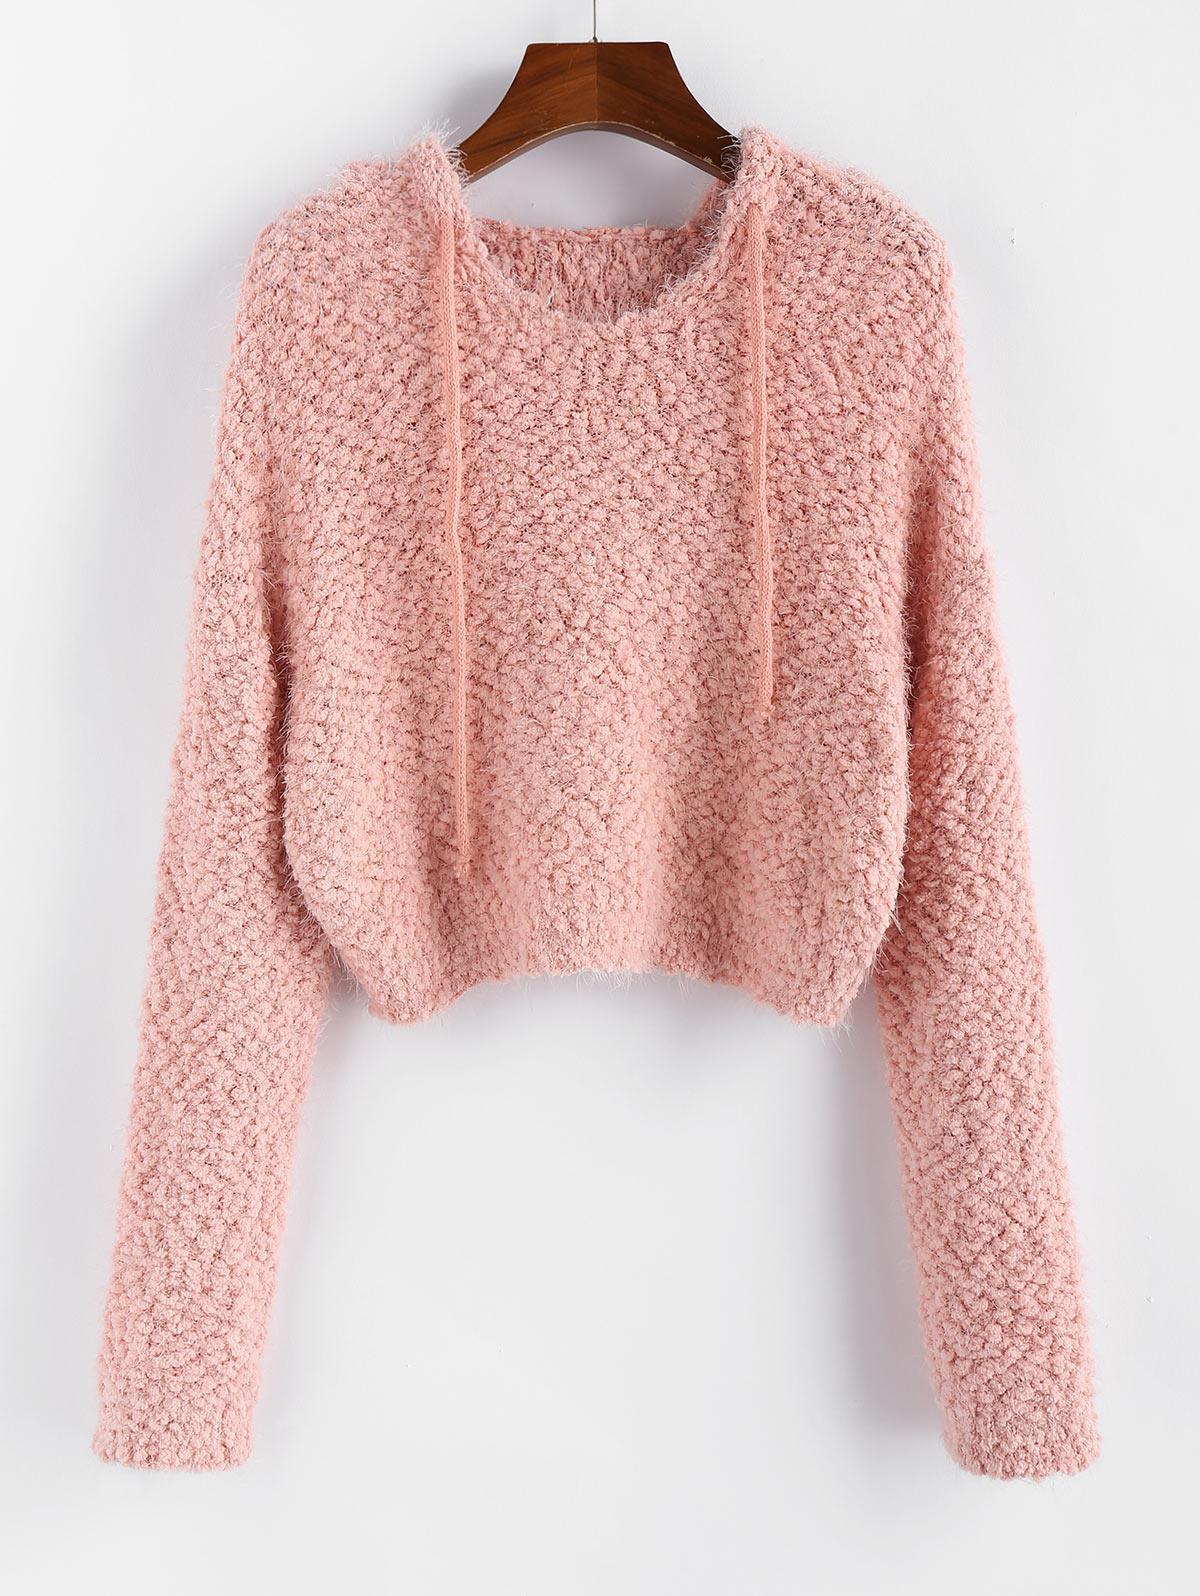 ZAFUL Popcorn Knit Hooded Fuzzy Sweater